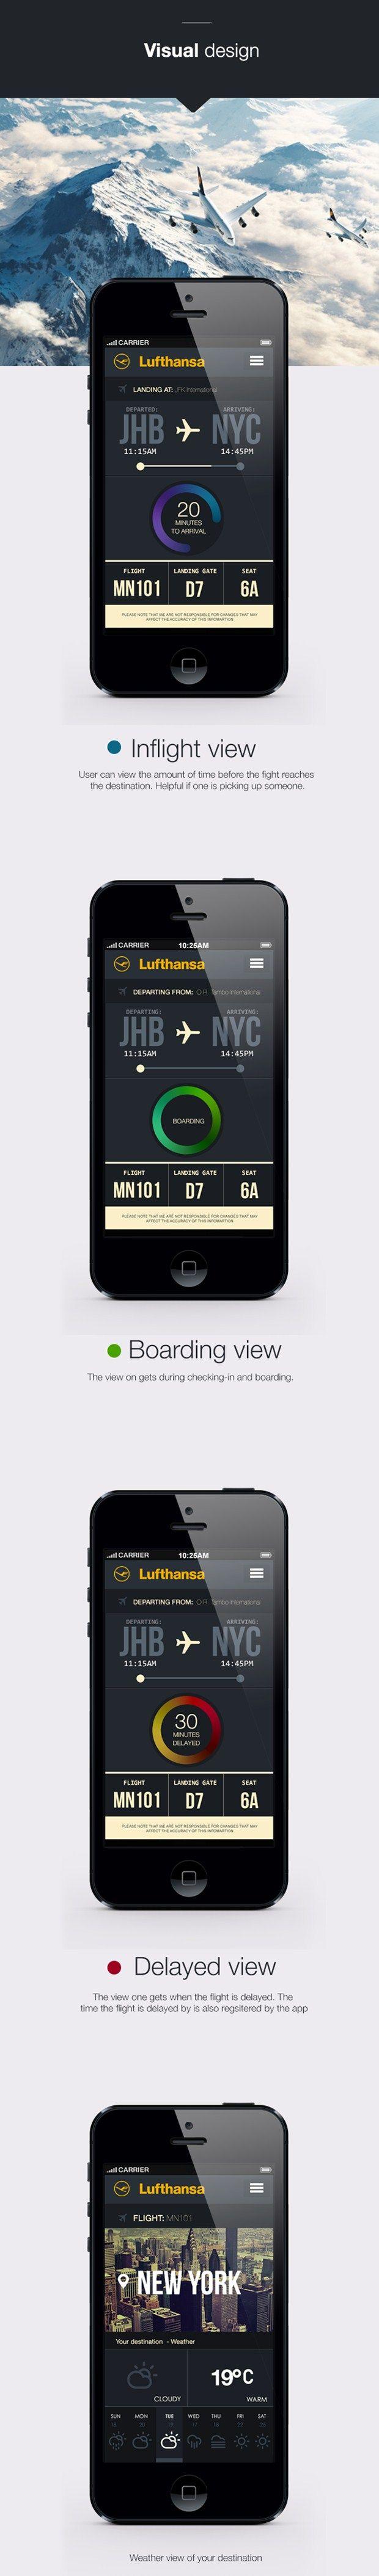 14-Lufthansa-flight-tracking iOS 7 App Design